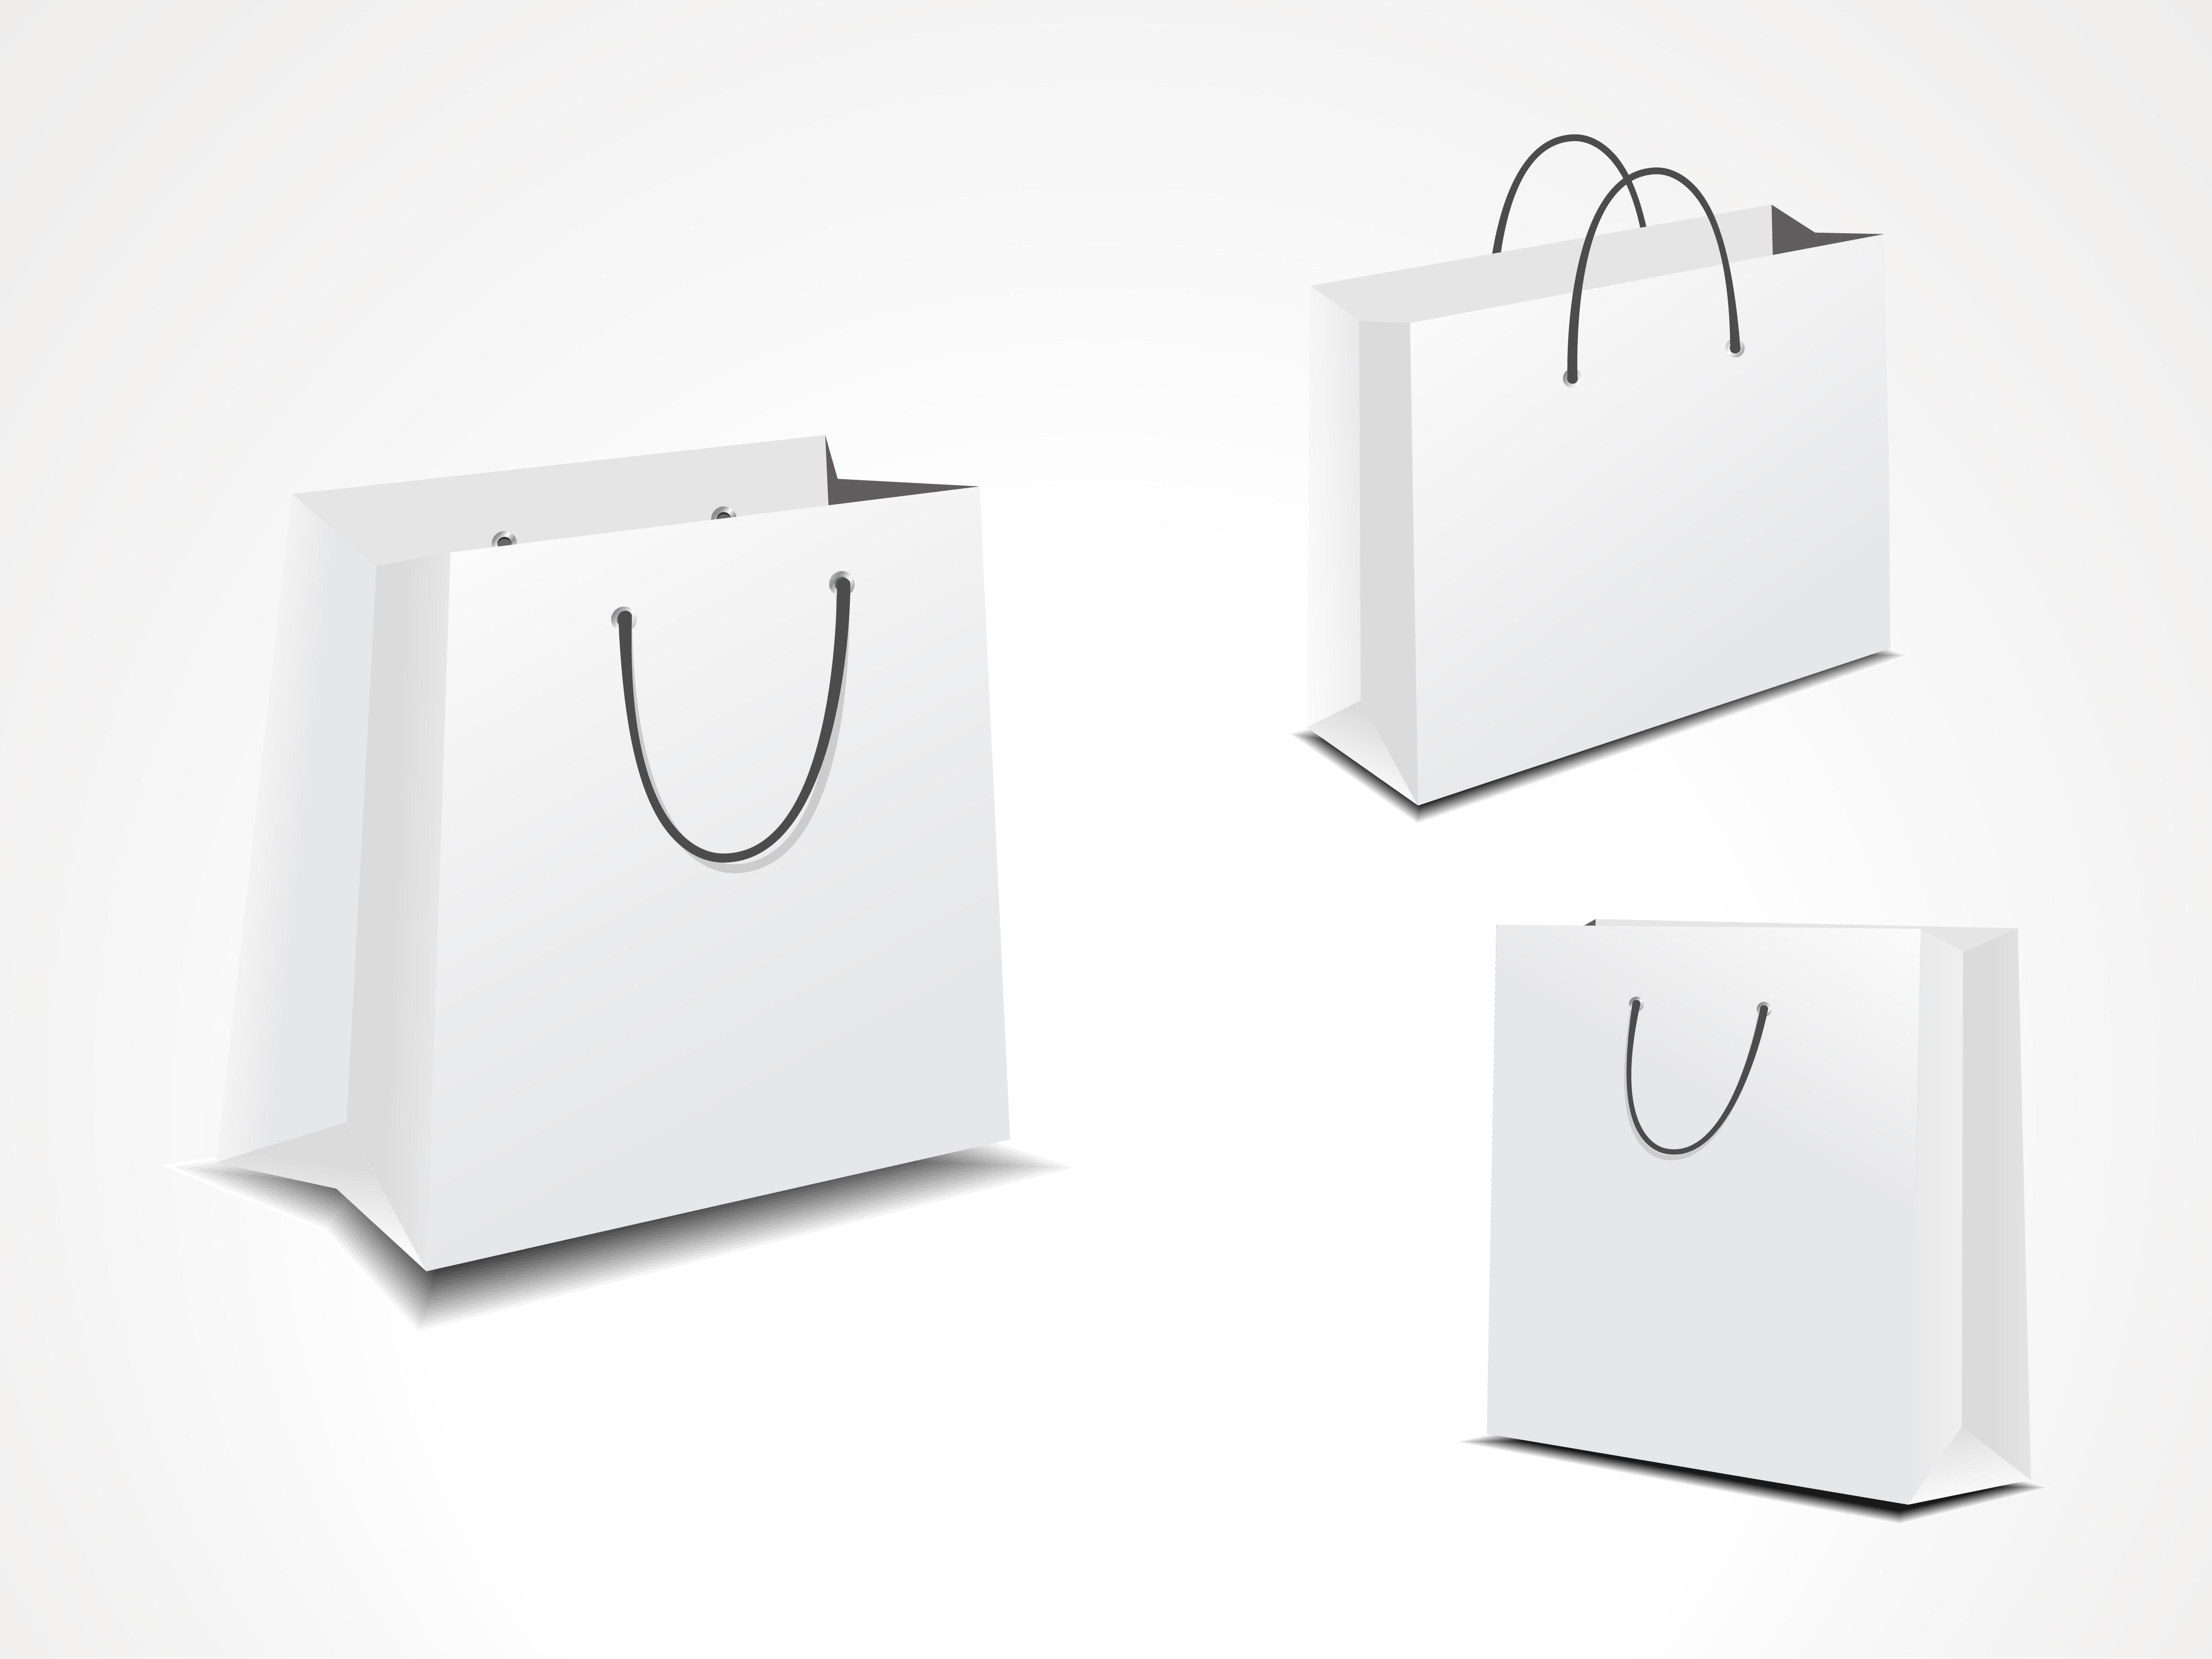 Paper Bag Template Free Vector Art